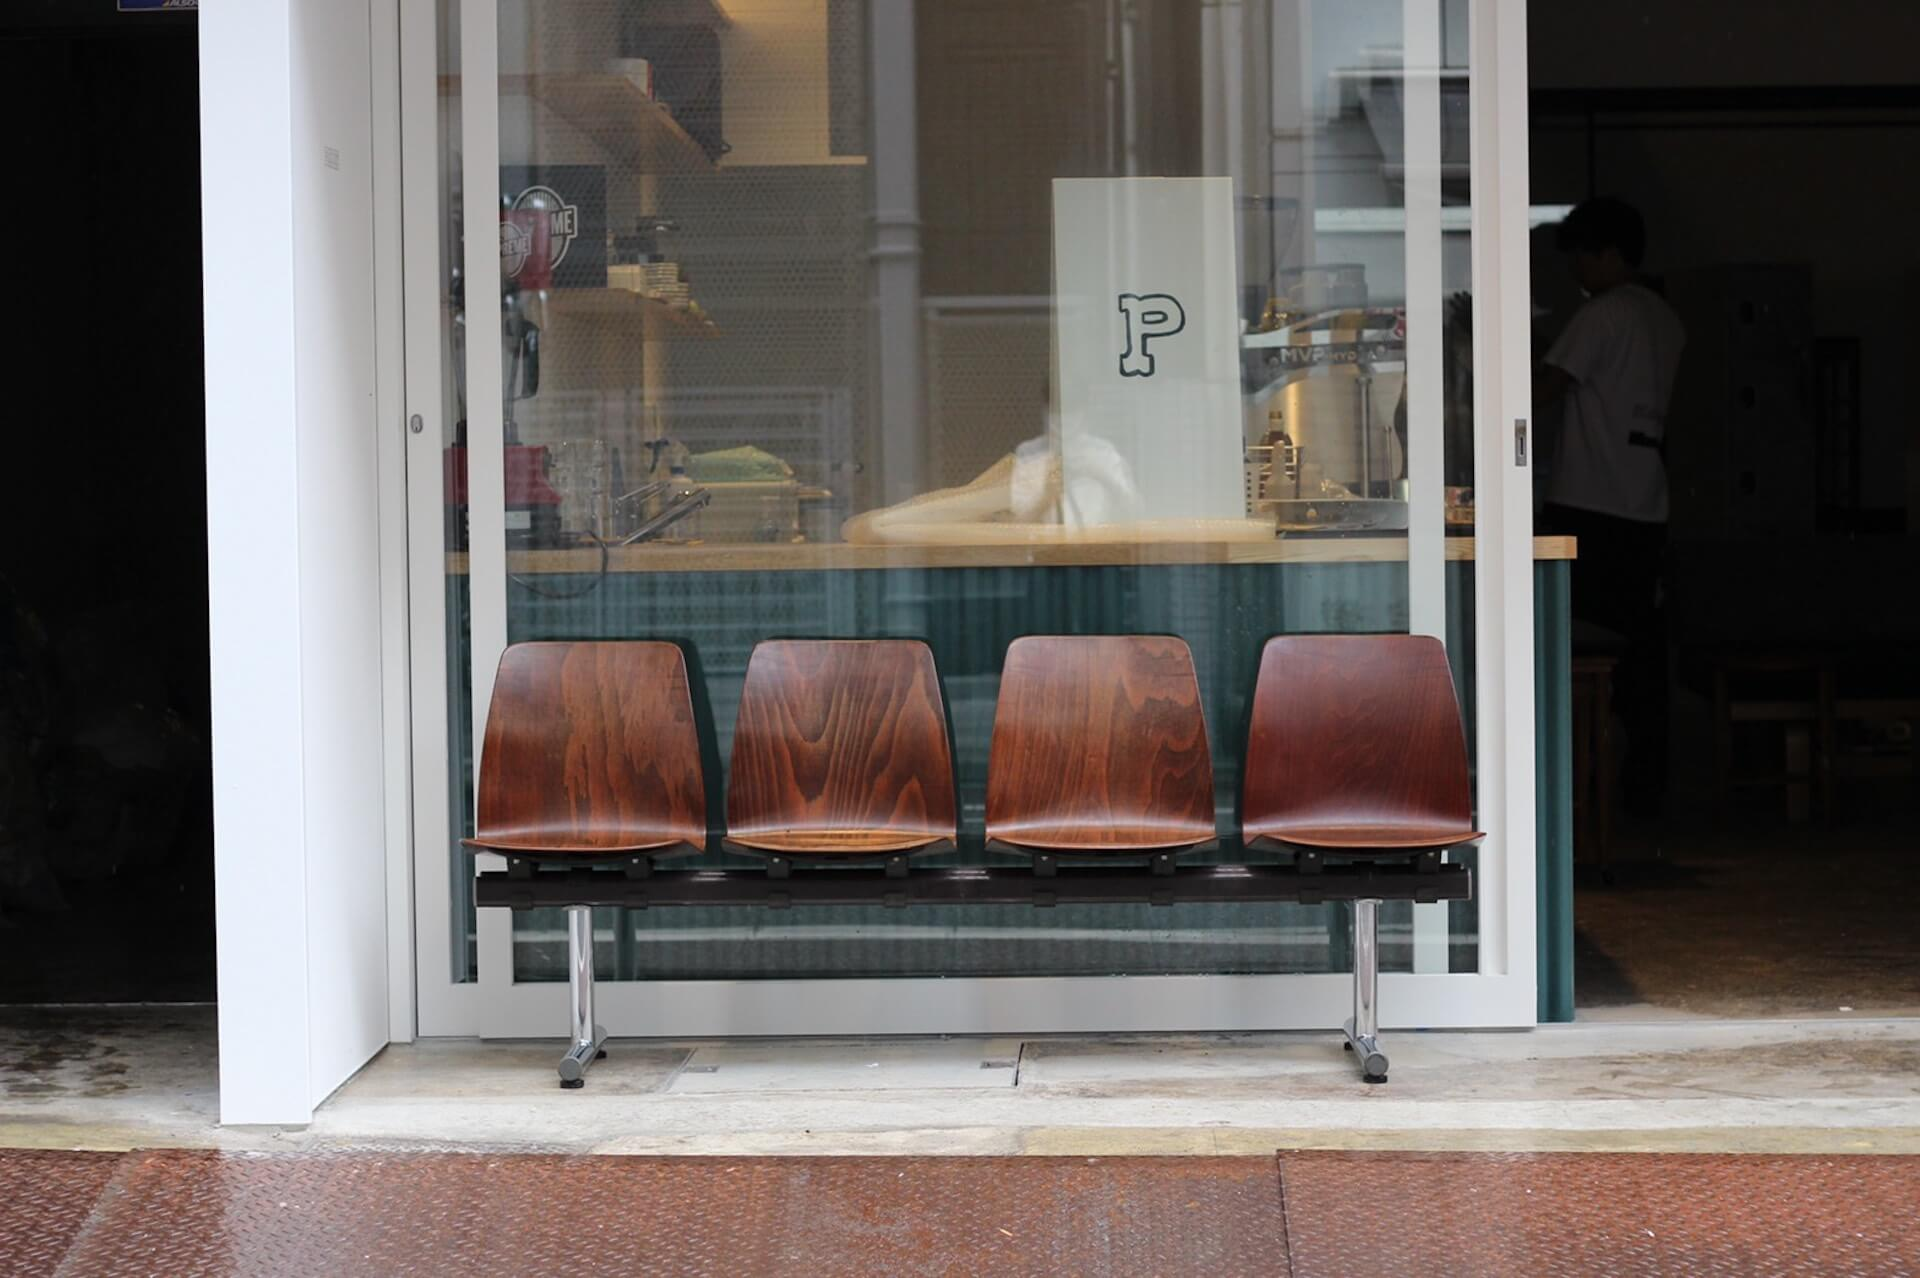 Coffee Supremeプロデュースのカフェ「Parlors」が馬喰横山の新施設みどり荘にオープン gourmet211014_parlors_2